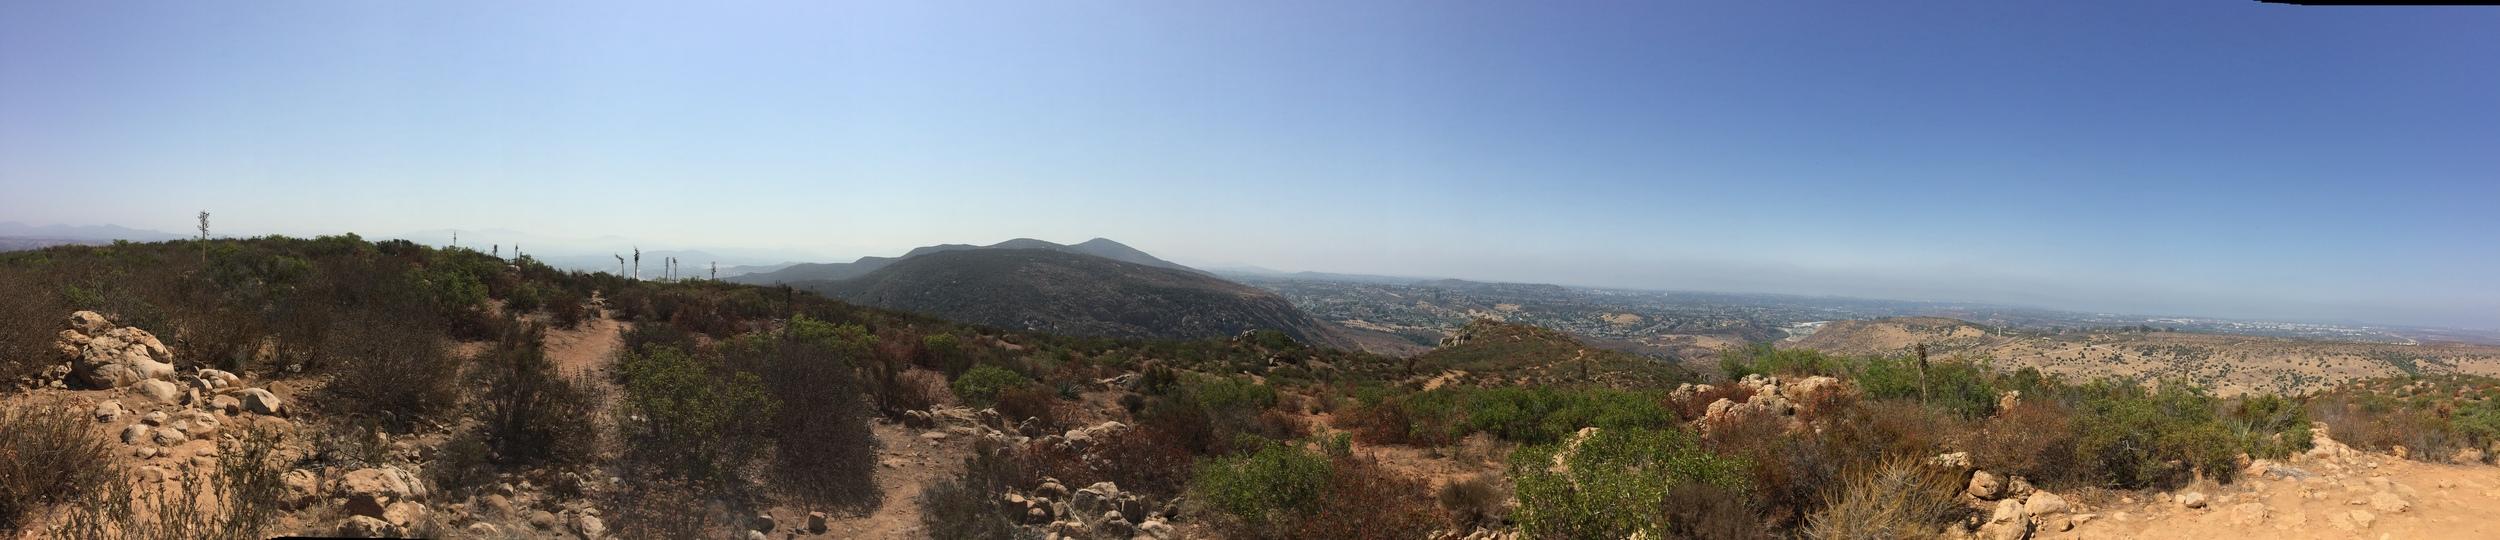 South facing summit panorama, South Fortuna Mountain